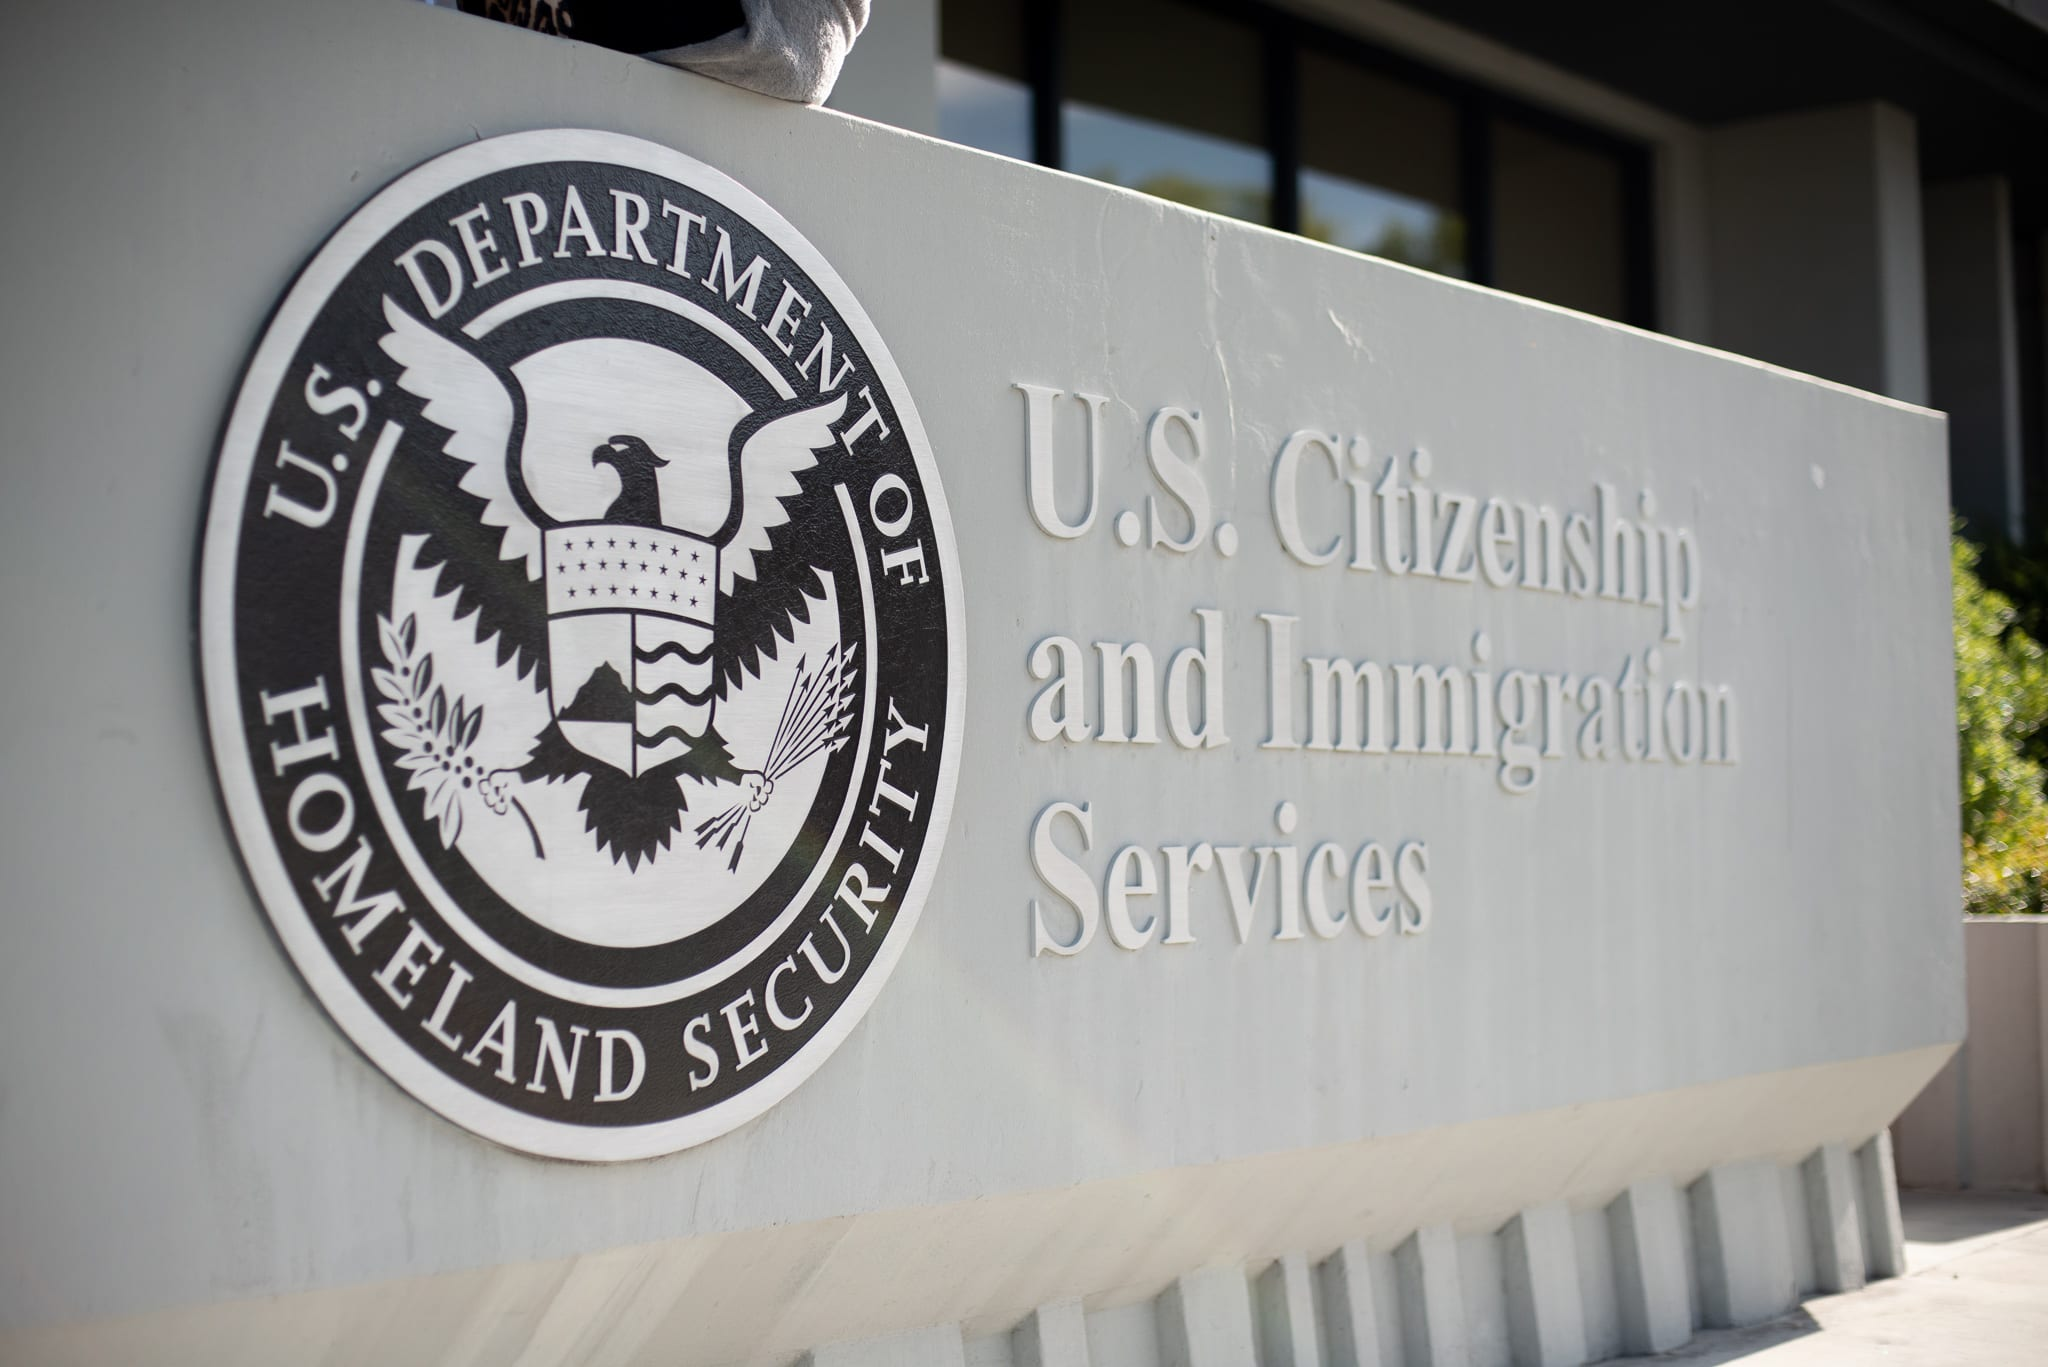 San Jose legislator pushes for immigration reforms amid COVID-19